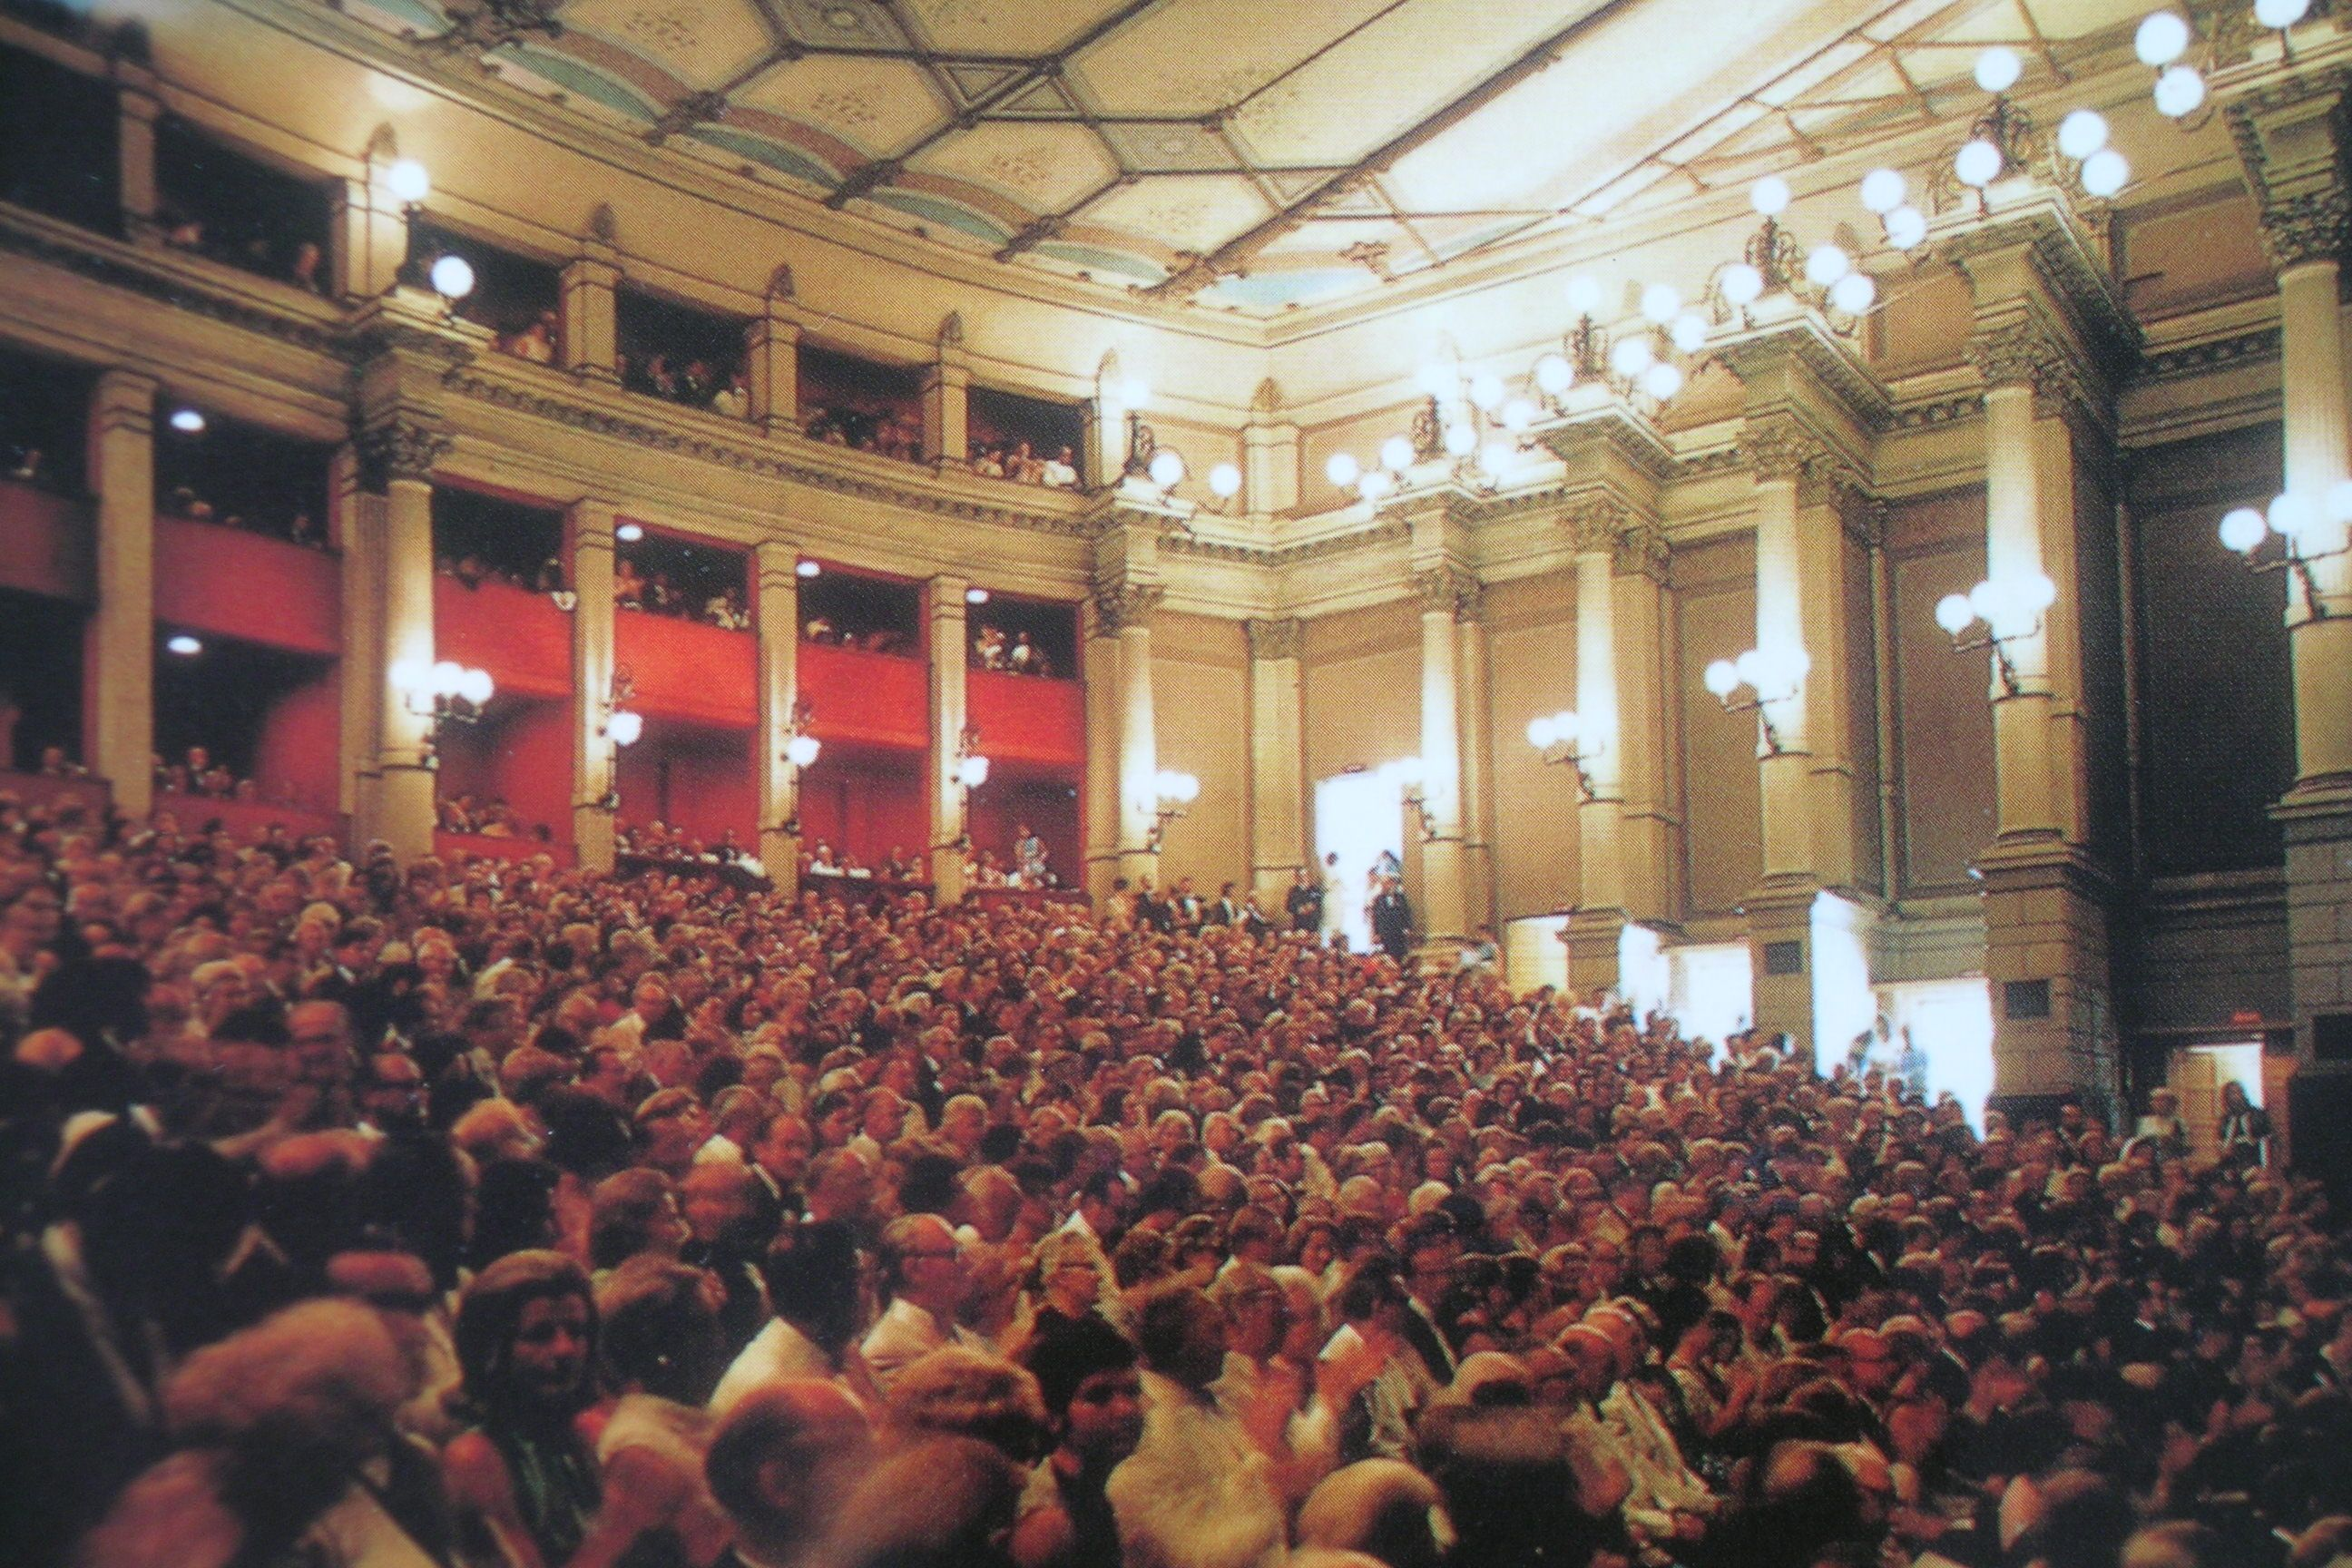 Image Result For Bayreuther Festspielhaus Innen Bayreuth Cool Places To Visit Places To Visit